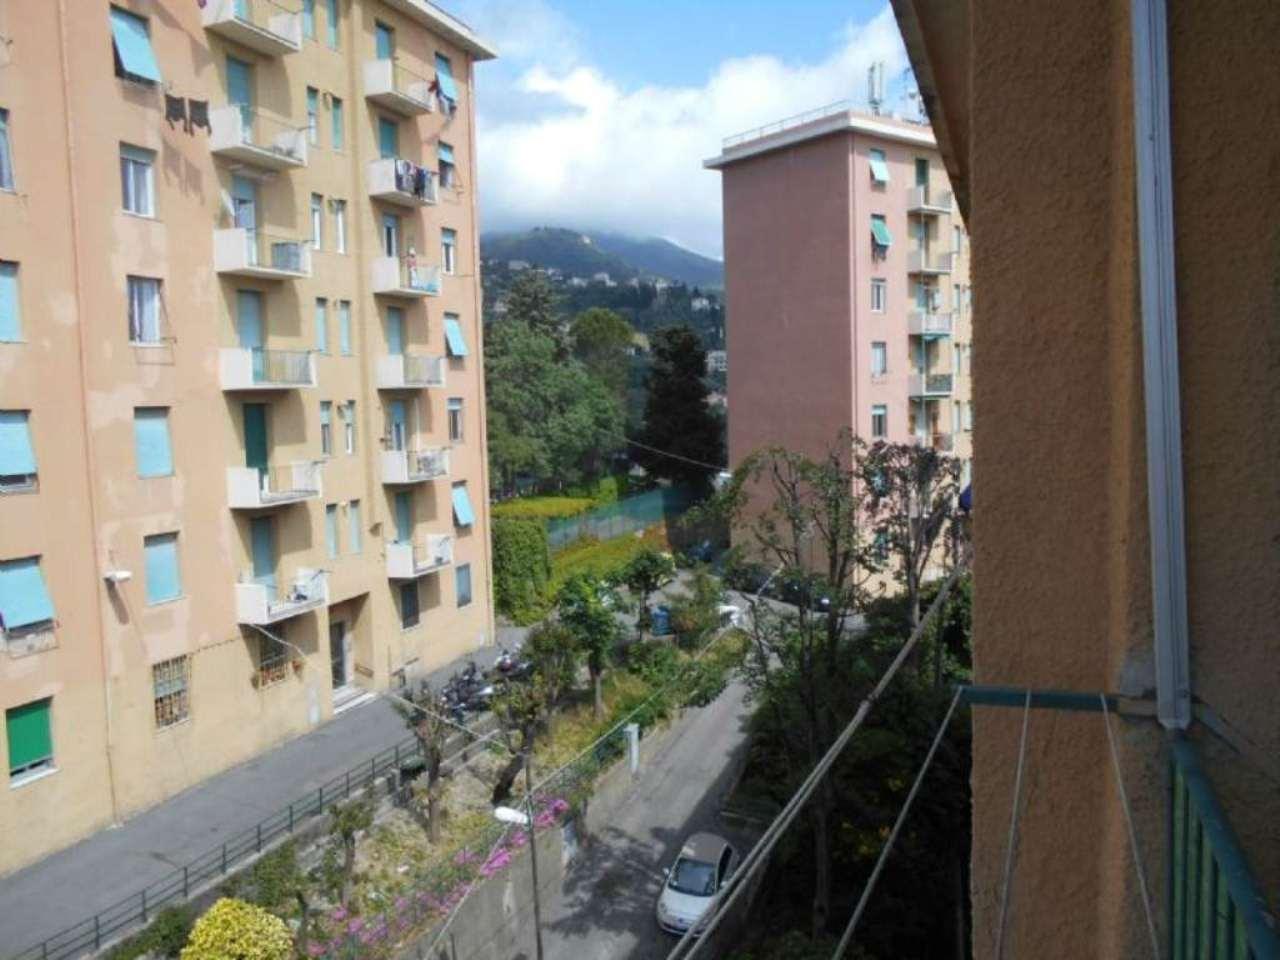 Bilocale Genova Via Copernico 2